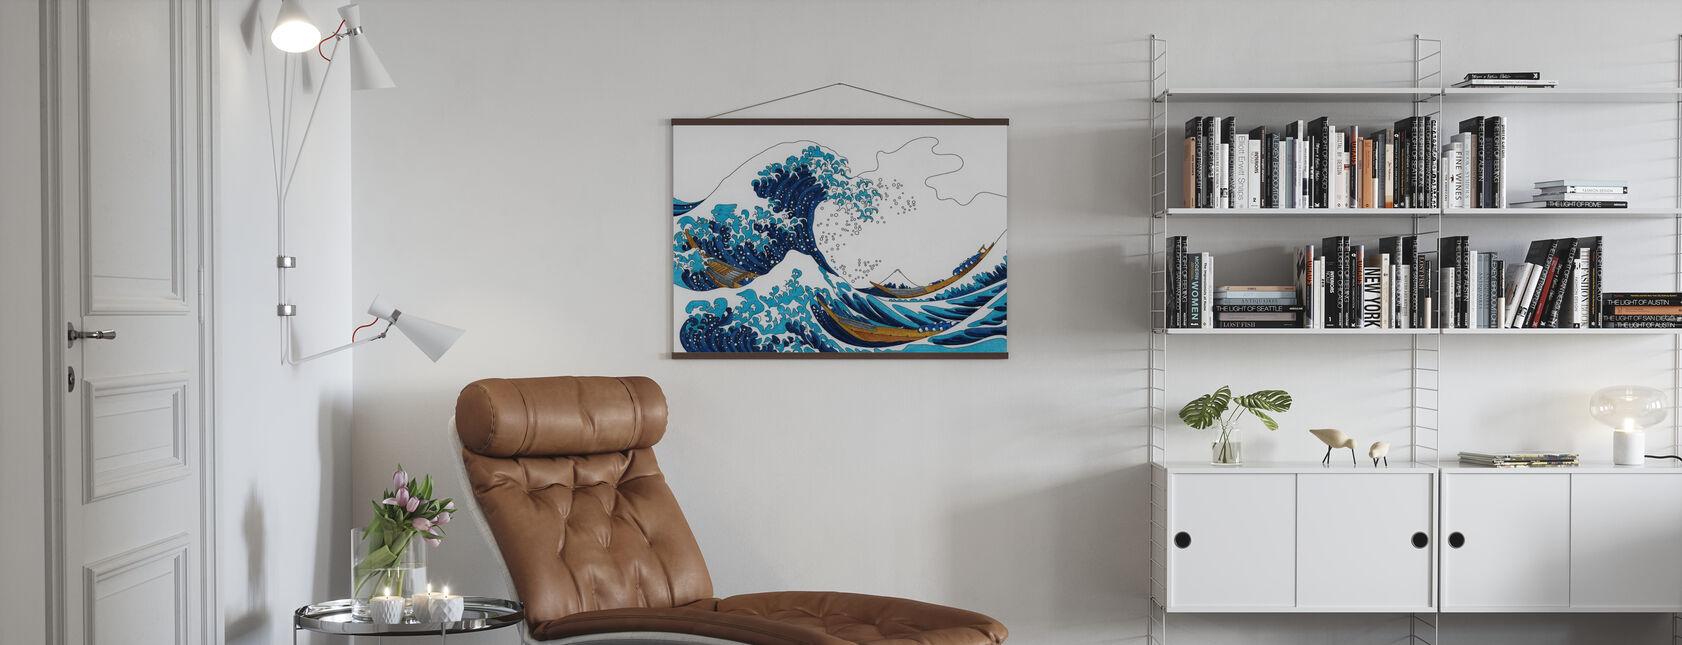 Great Wave of Kanagawa - Poster - Living Room